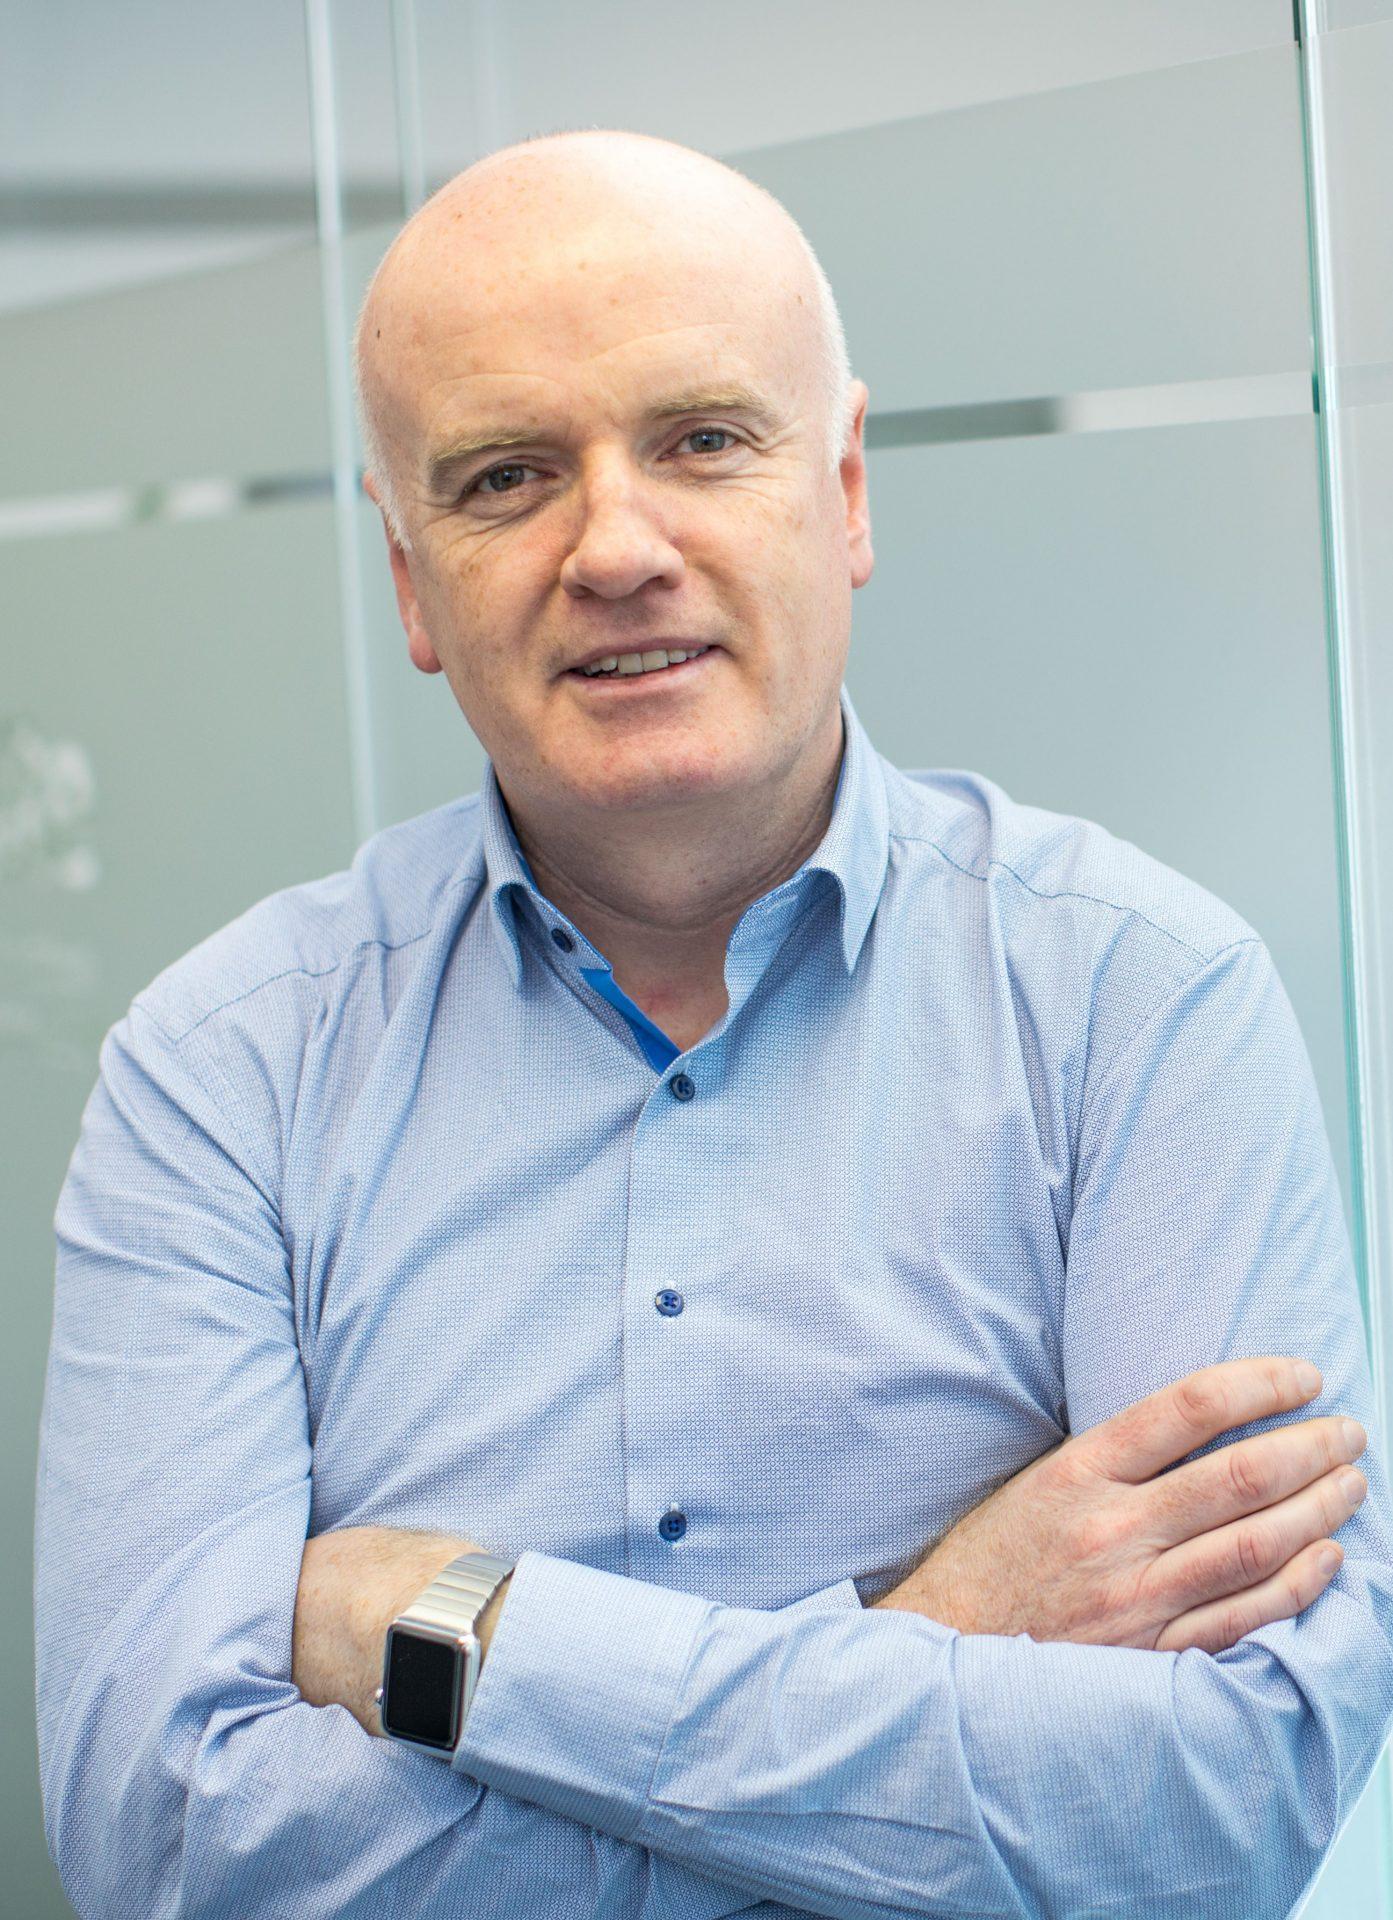 Ian Duggan CEO of Indigo profile pic